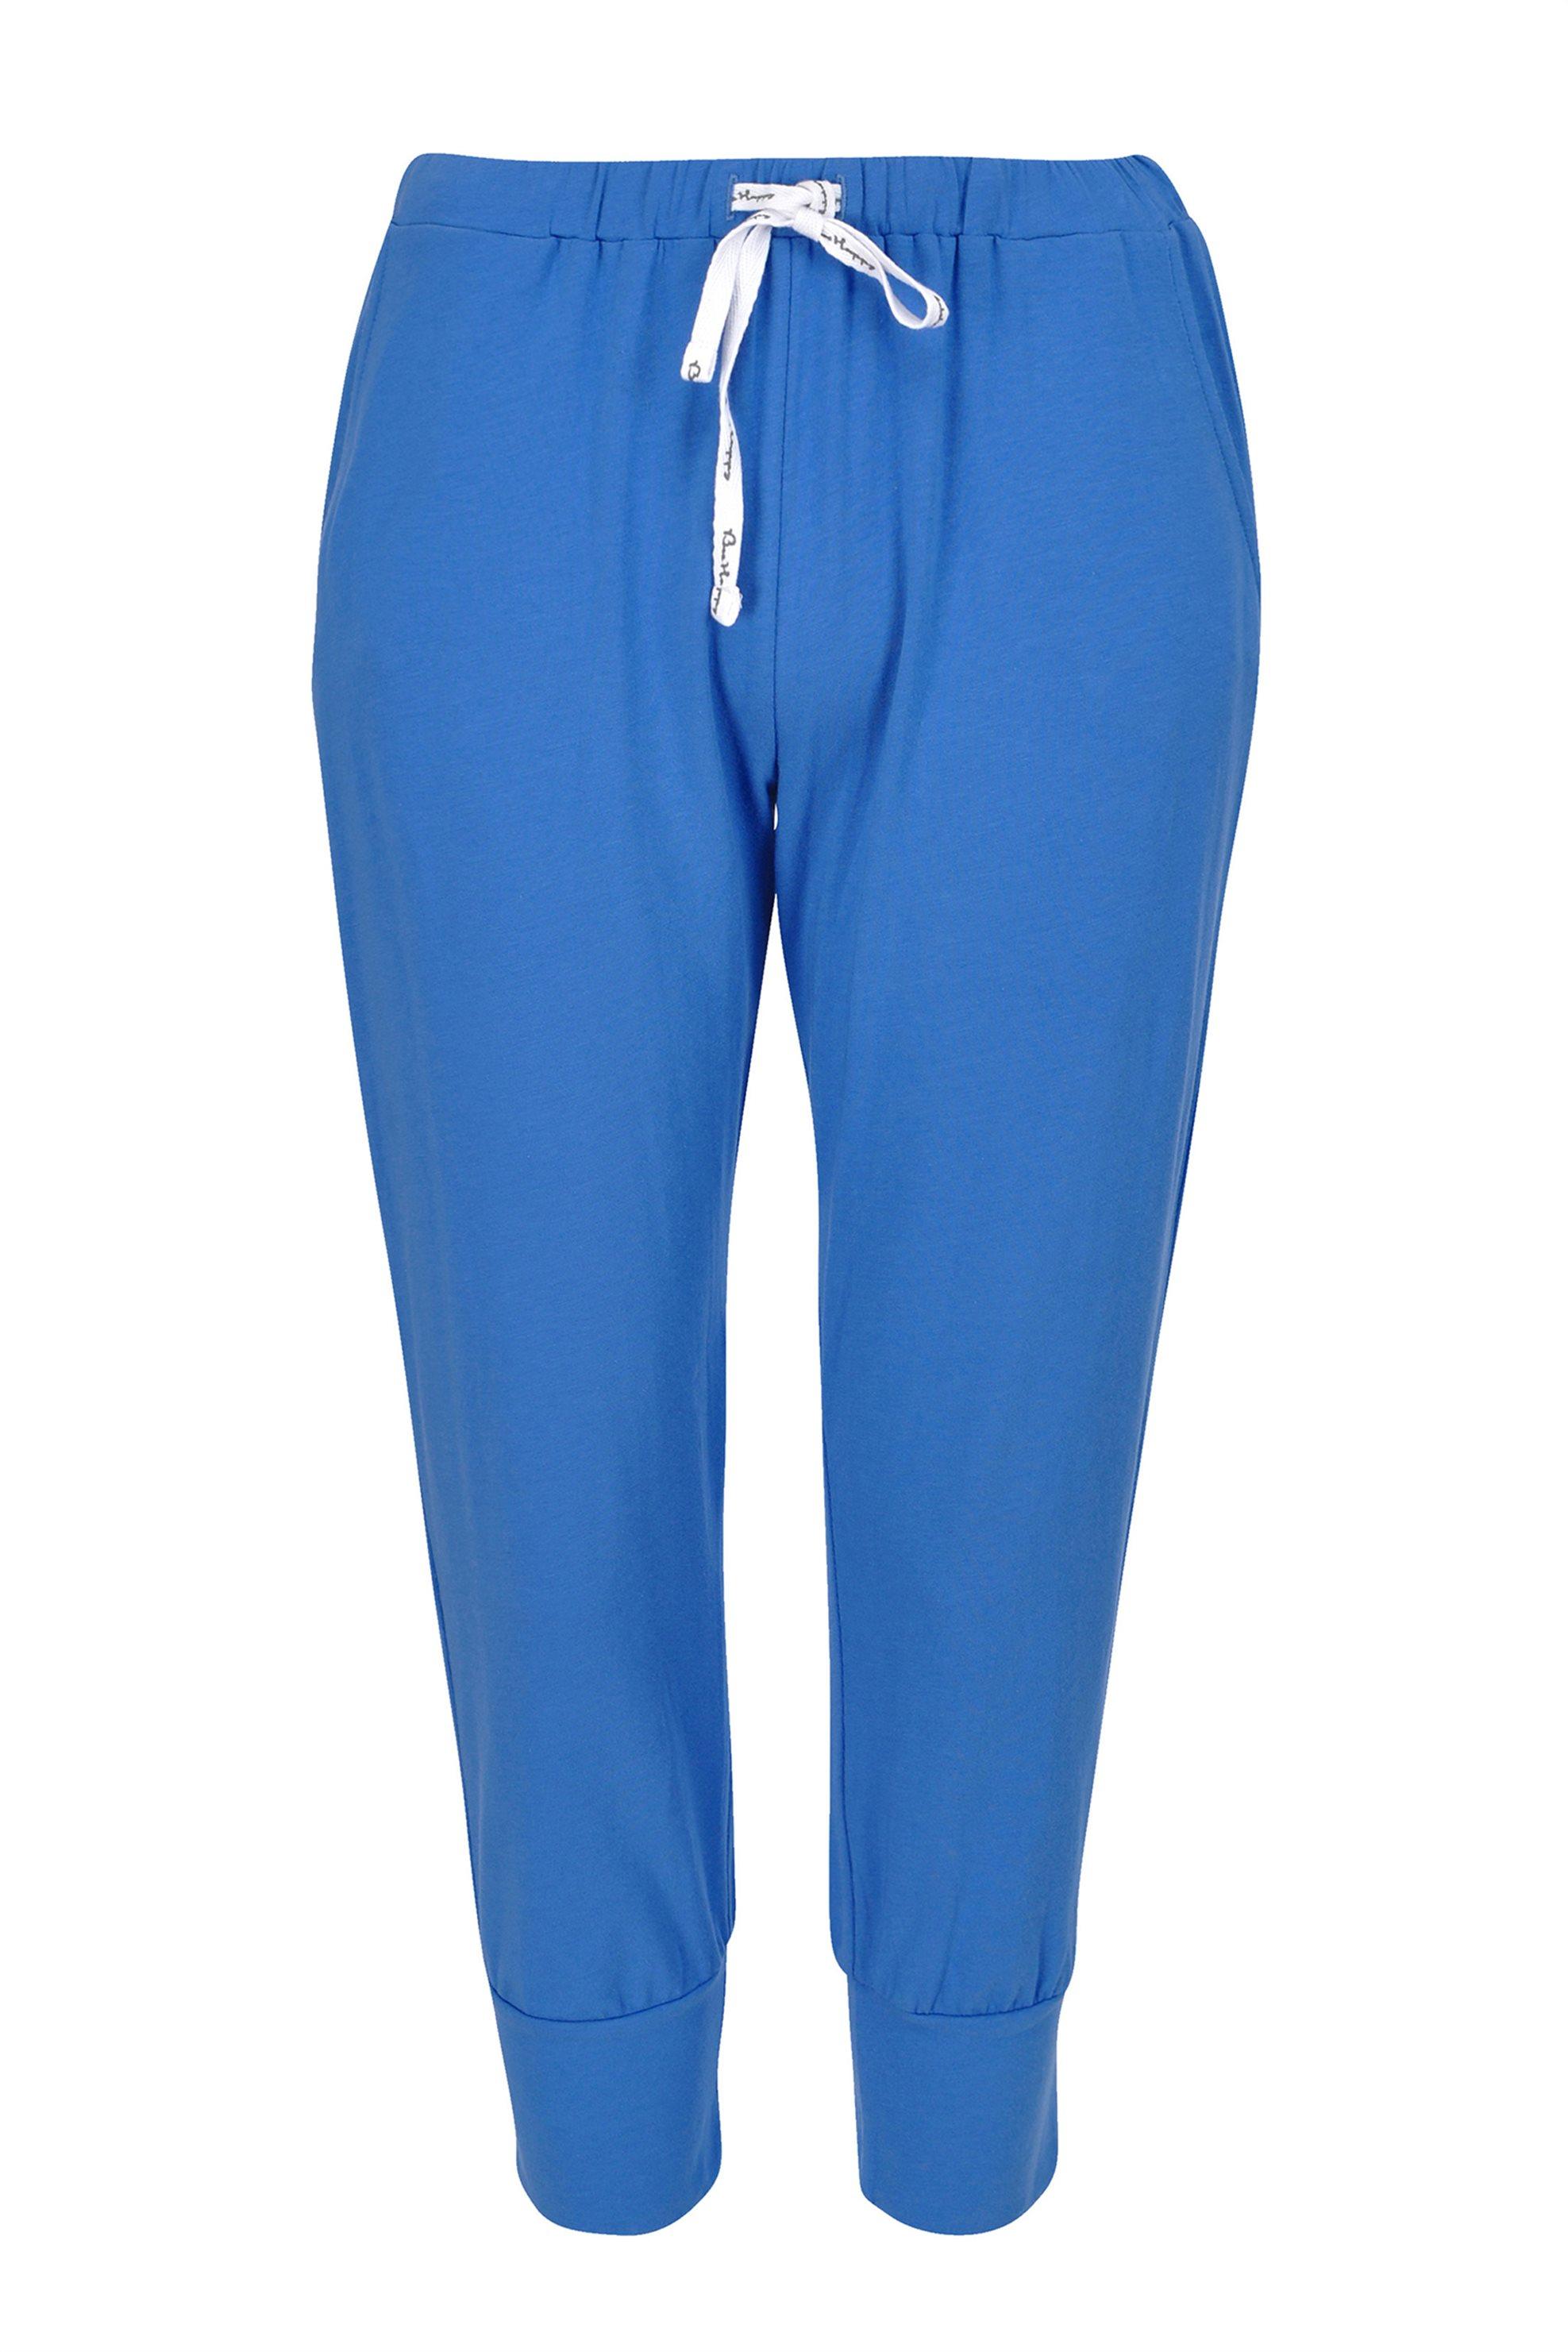 Rösch γυναικείο παντελόνι πιτζάμας μονόχρωμο με τσέπες - 2173353 - Μπλε Ηλεκτρίκ